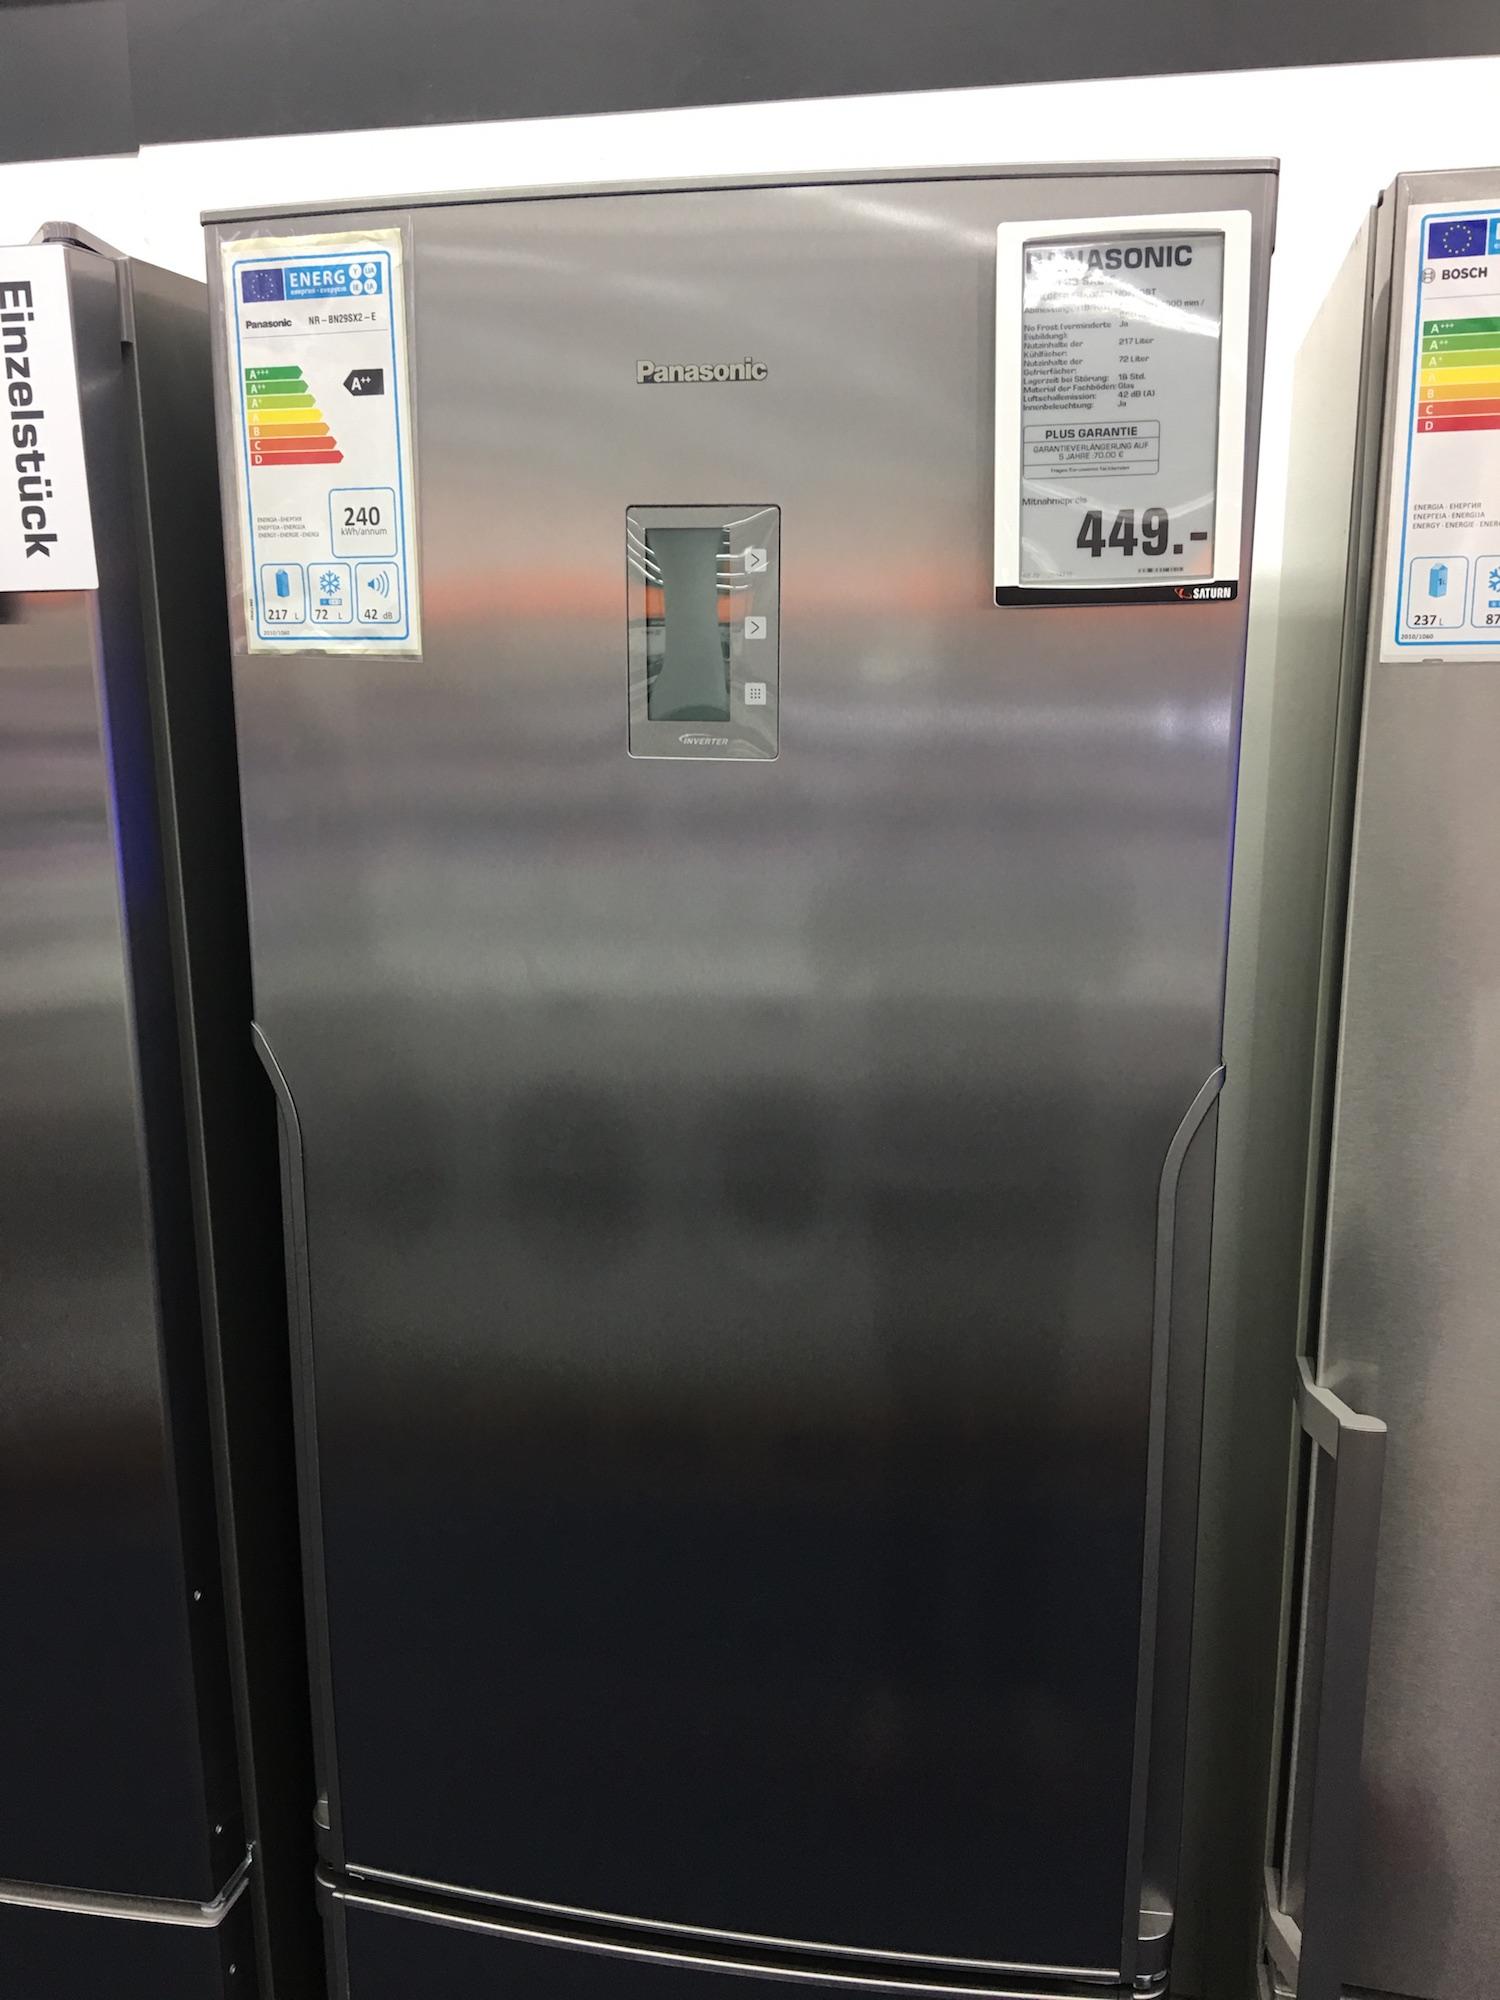 [Saturn Köln Hansaring] Panasonic Kühlgefrierkombi Nofrost NR-BN 29 SX2-E für 449€